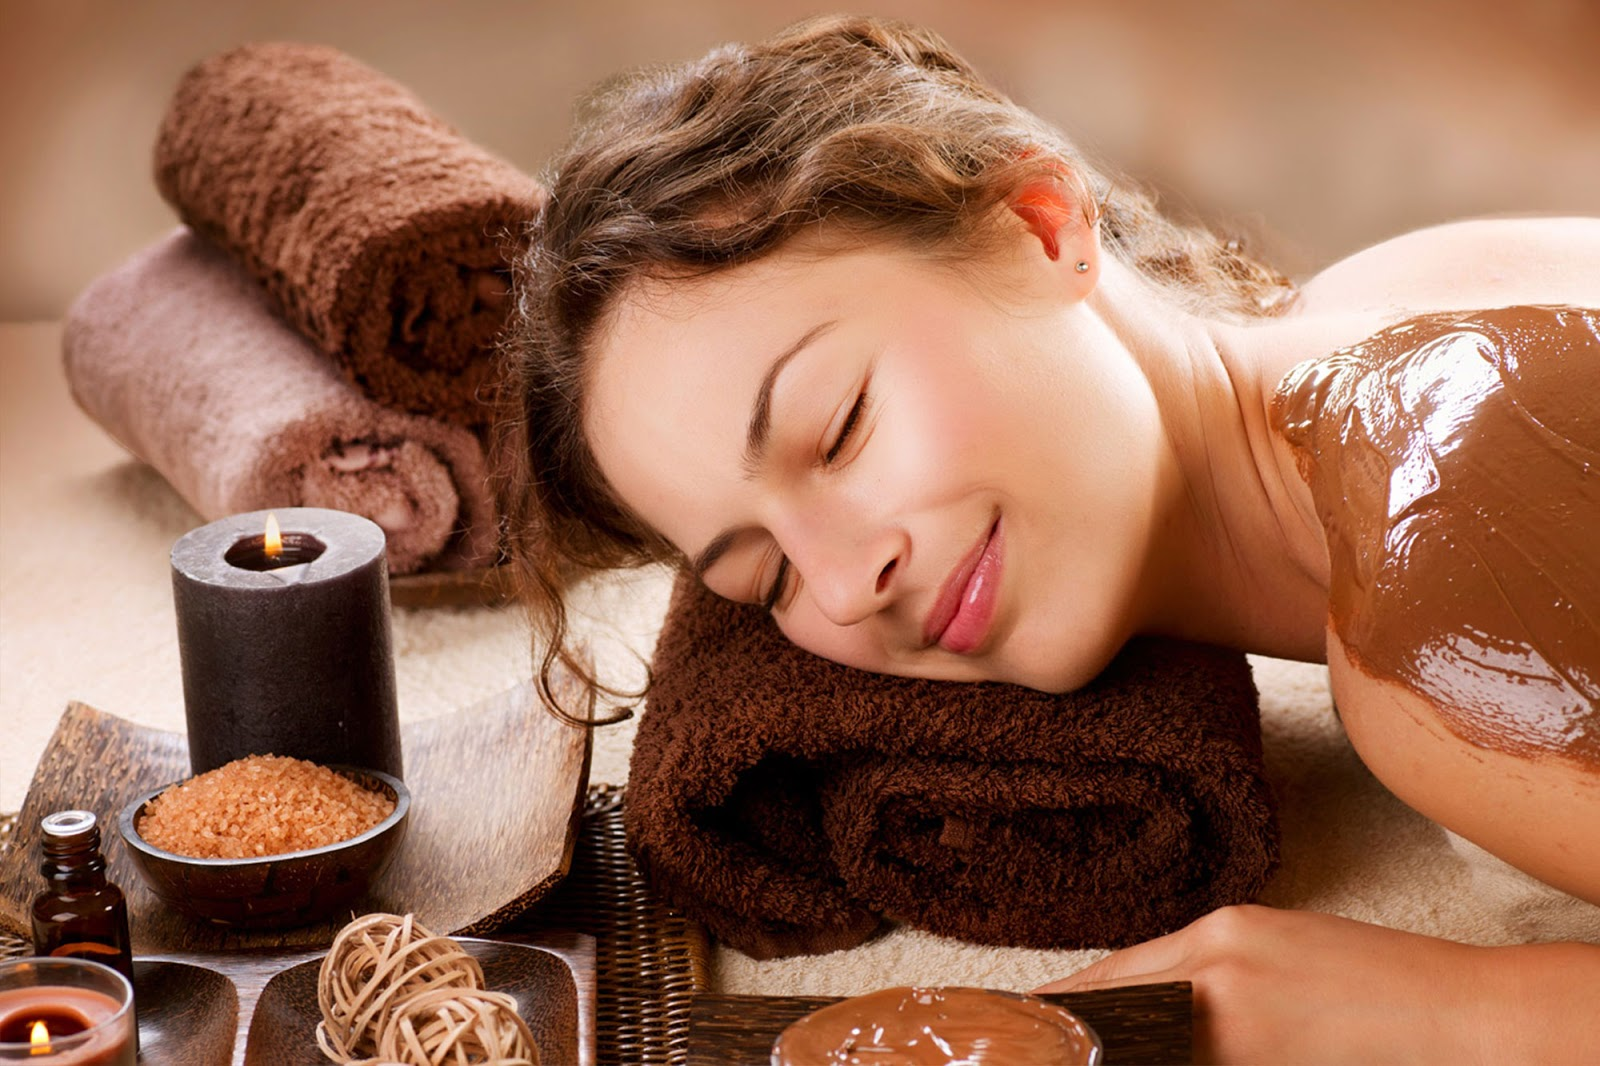 Get Full Body Massage In The Best Spa Of Delhi December 2016-6521